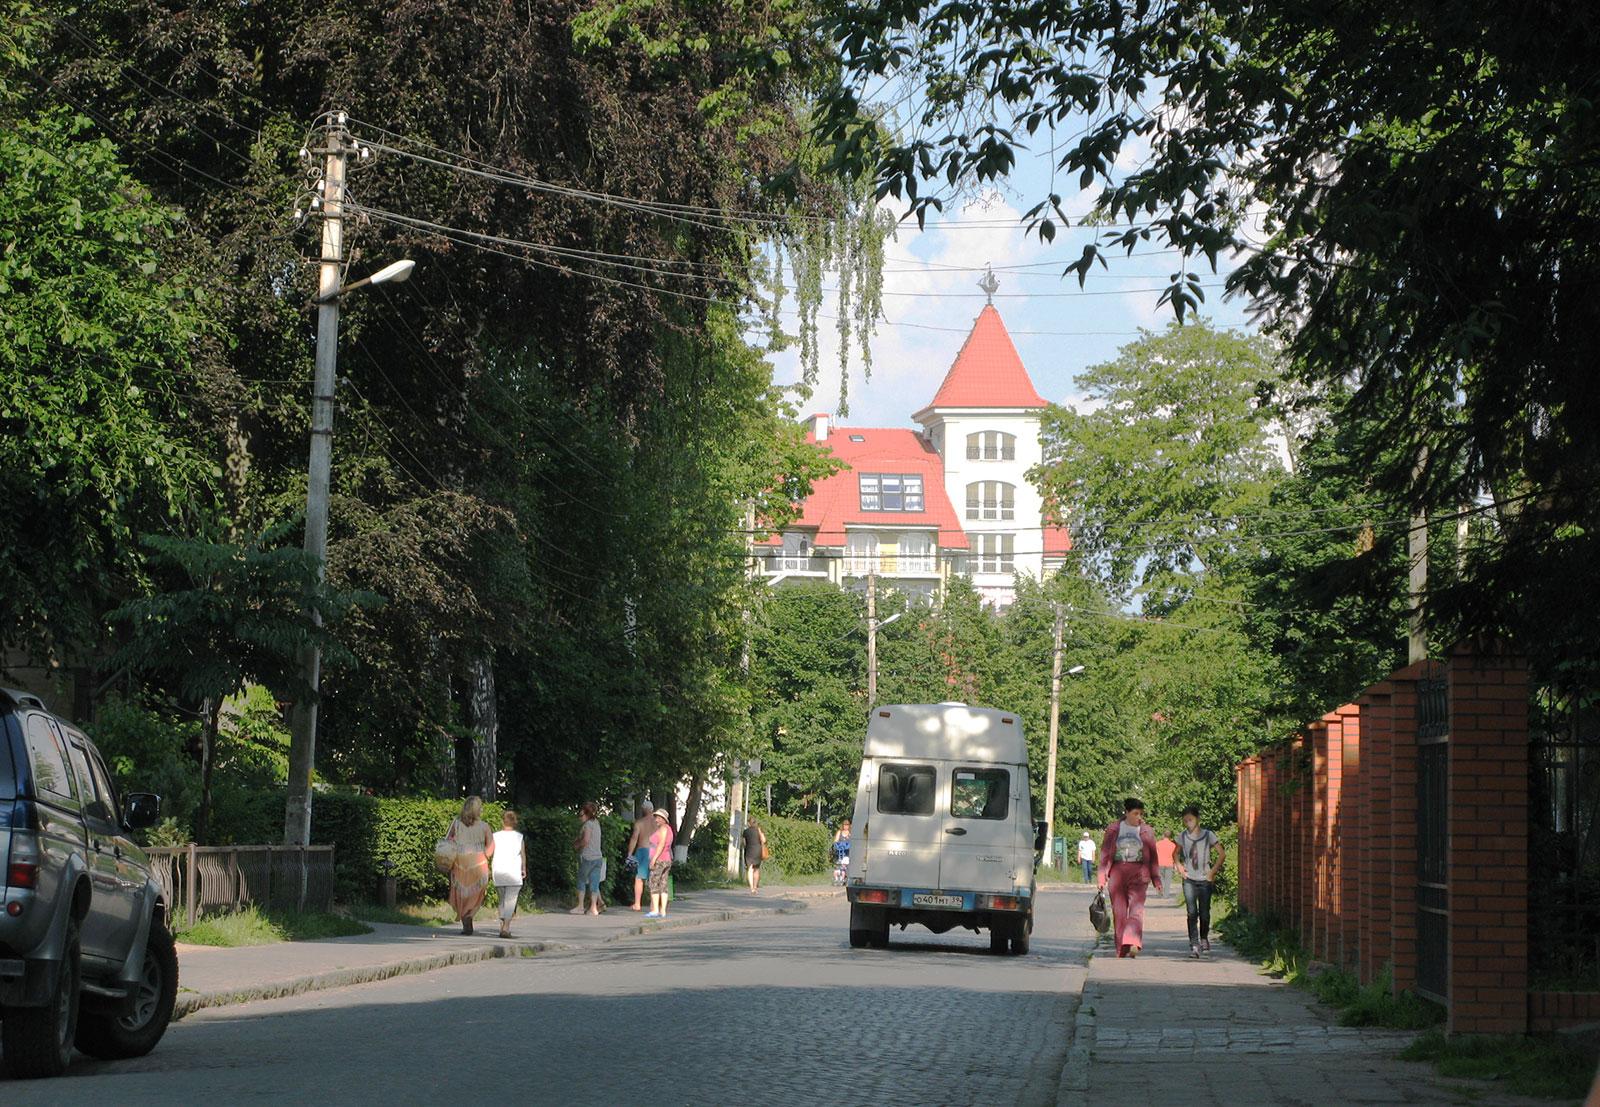 улица с брусчаткой